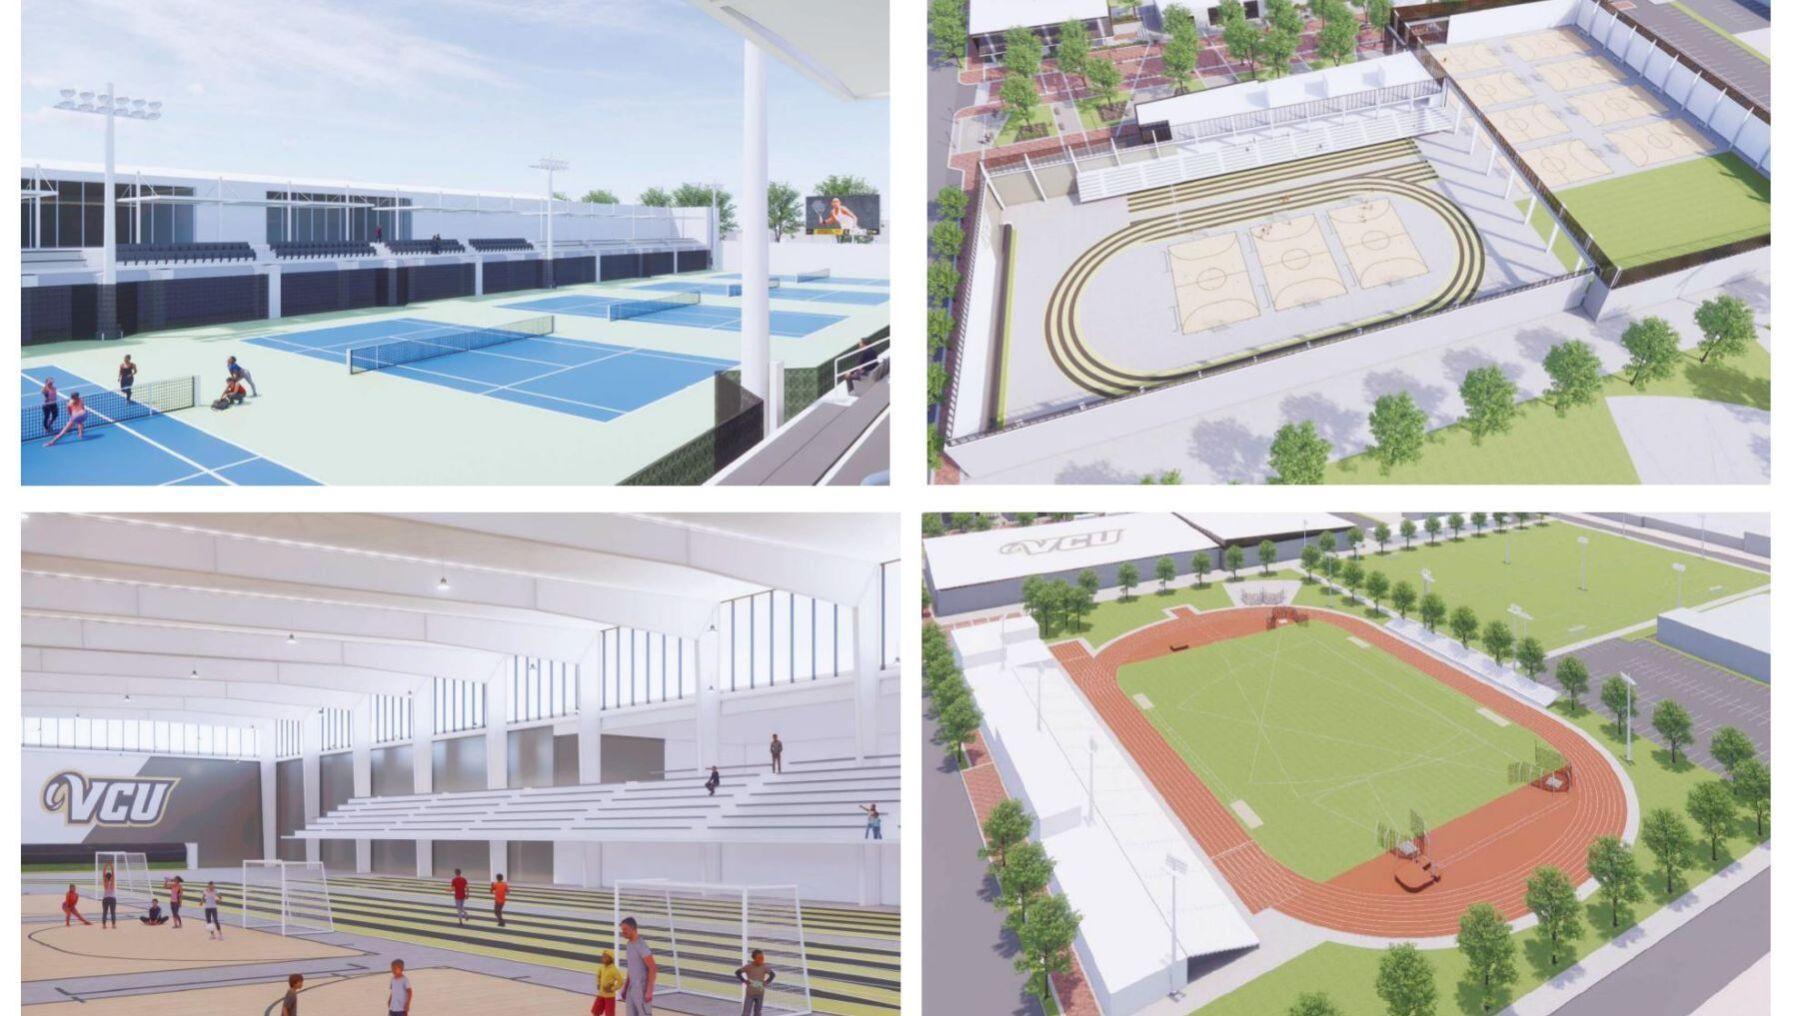 Vcu 2022 Calendar.New Buildings Coming To Vcu Athletics Village Student Commons High Rise Dorm Arts Lab Richmond Local News Richmond Com